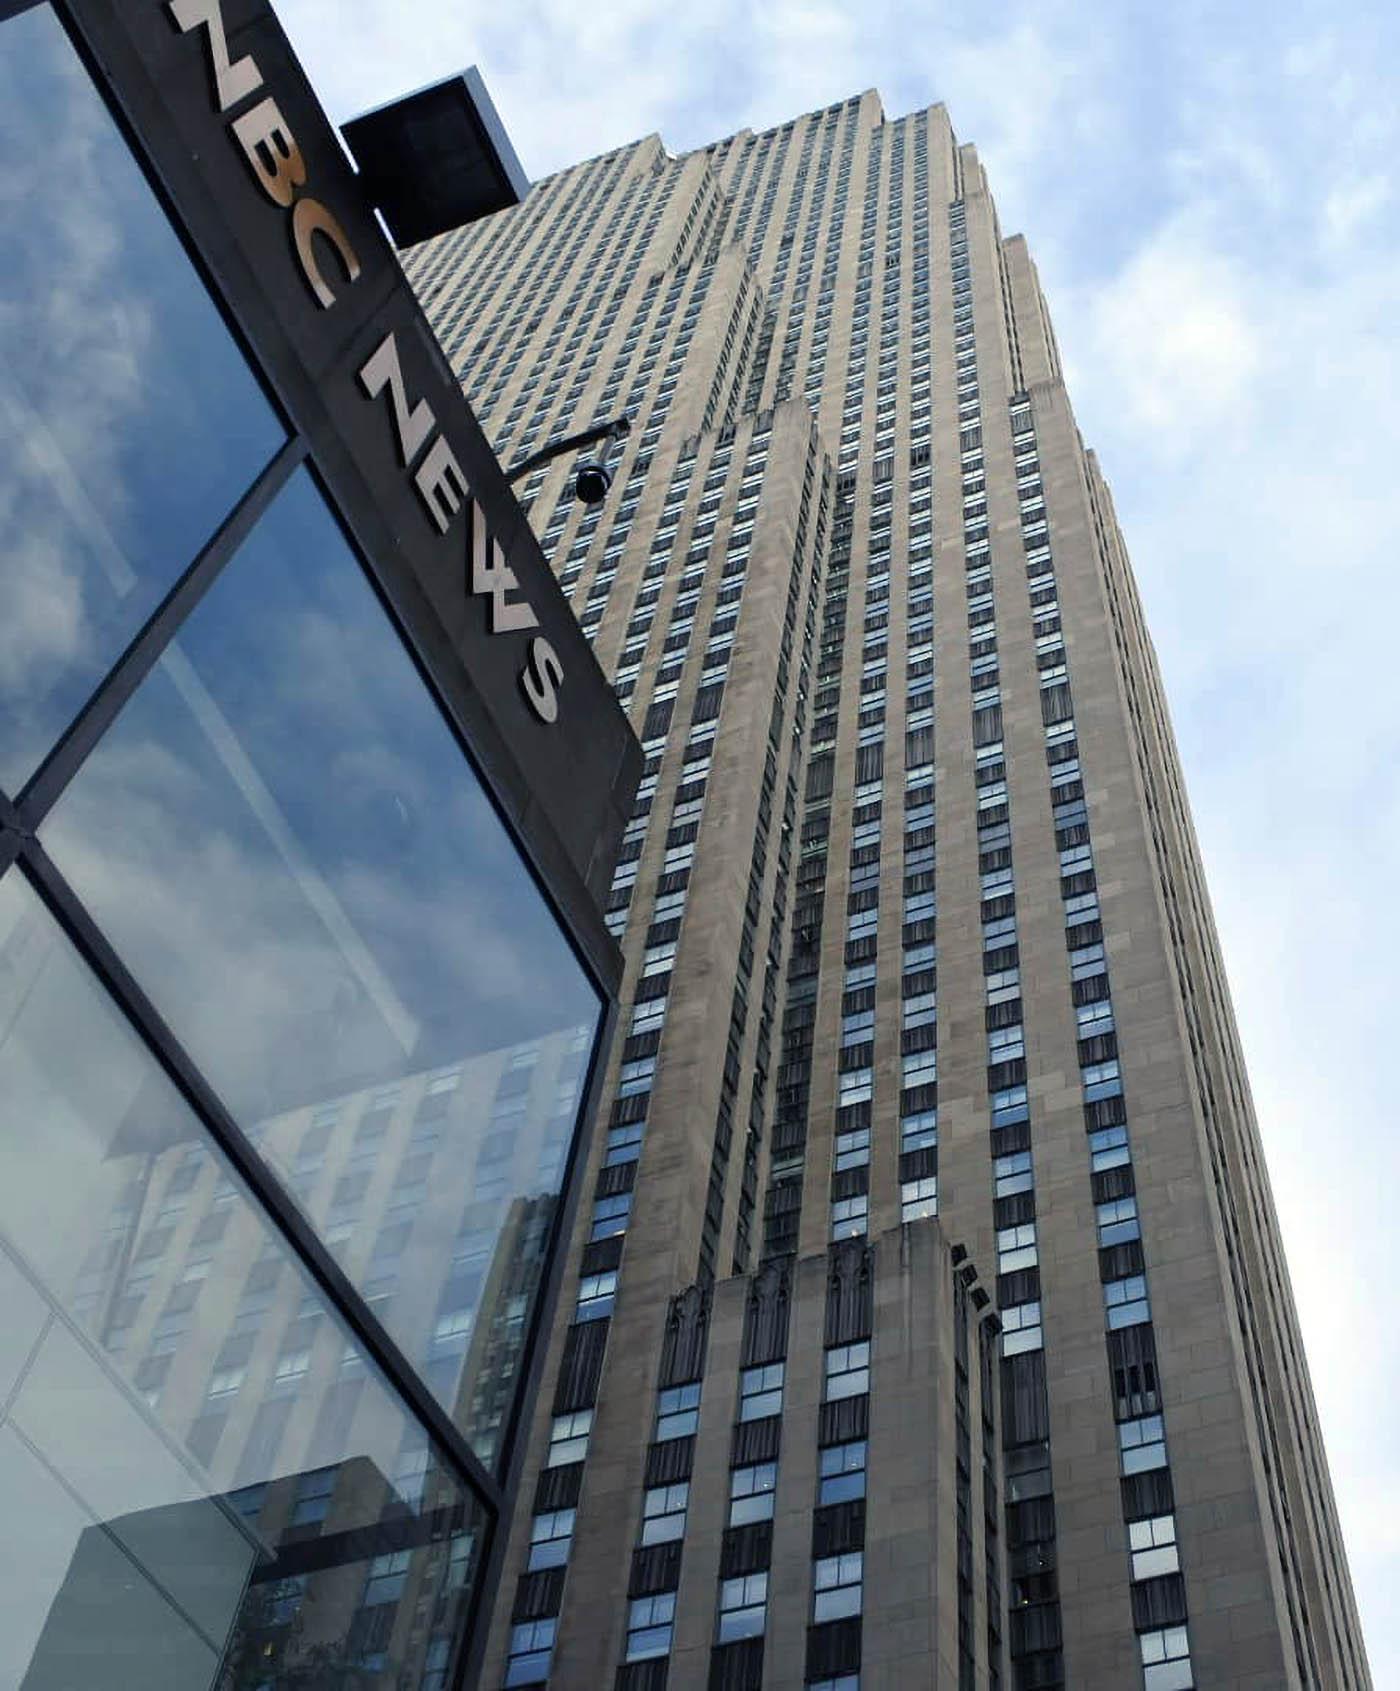 NBC News studio building